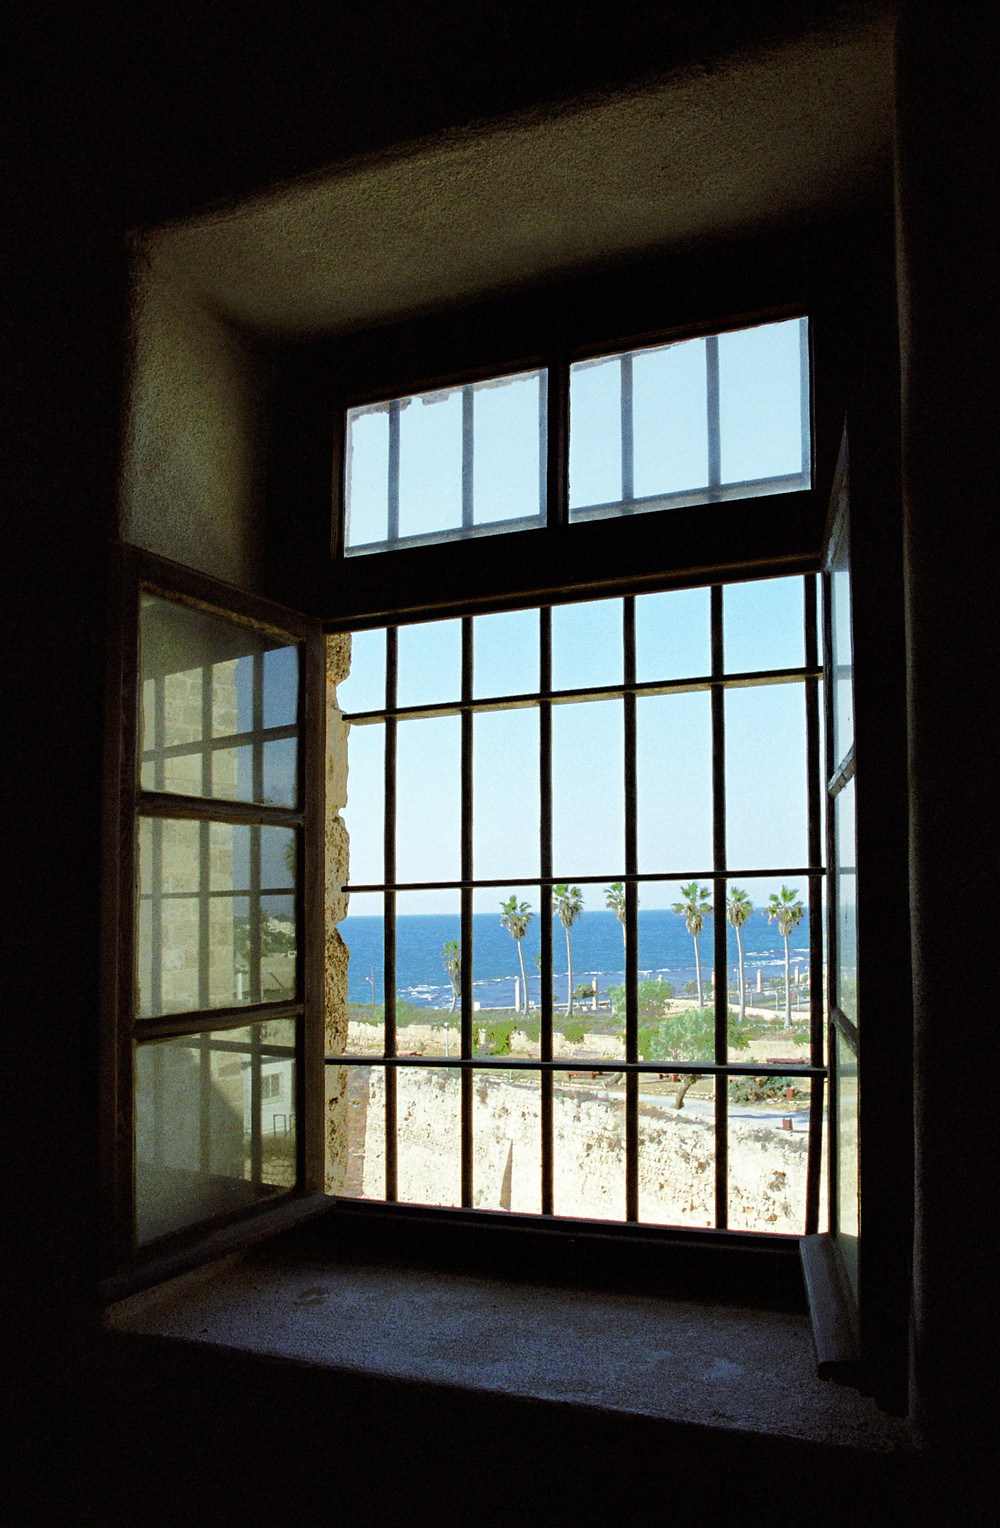 A janela da cela de Bahá'u'lláh